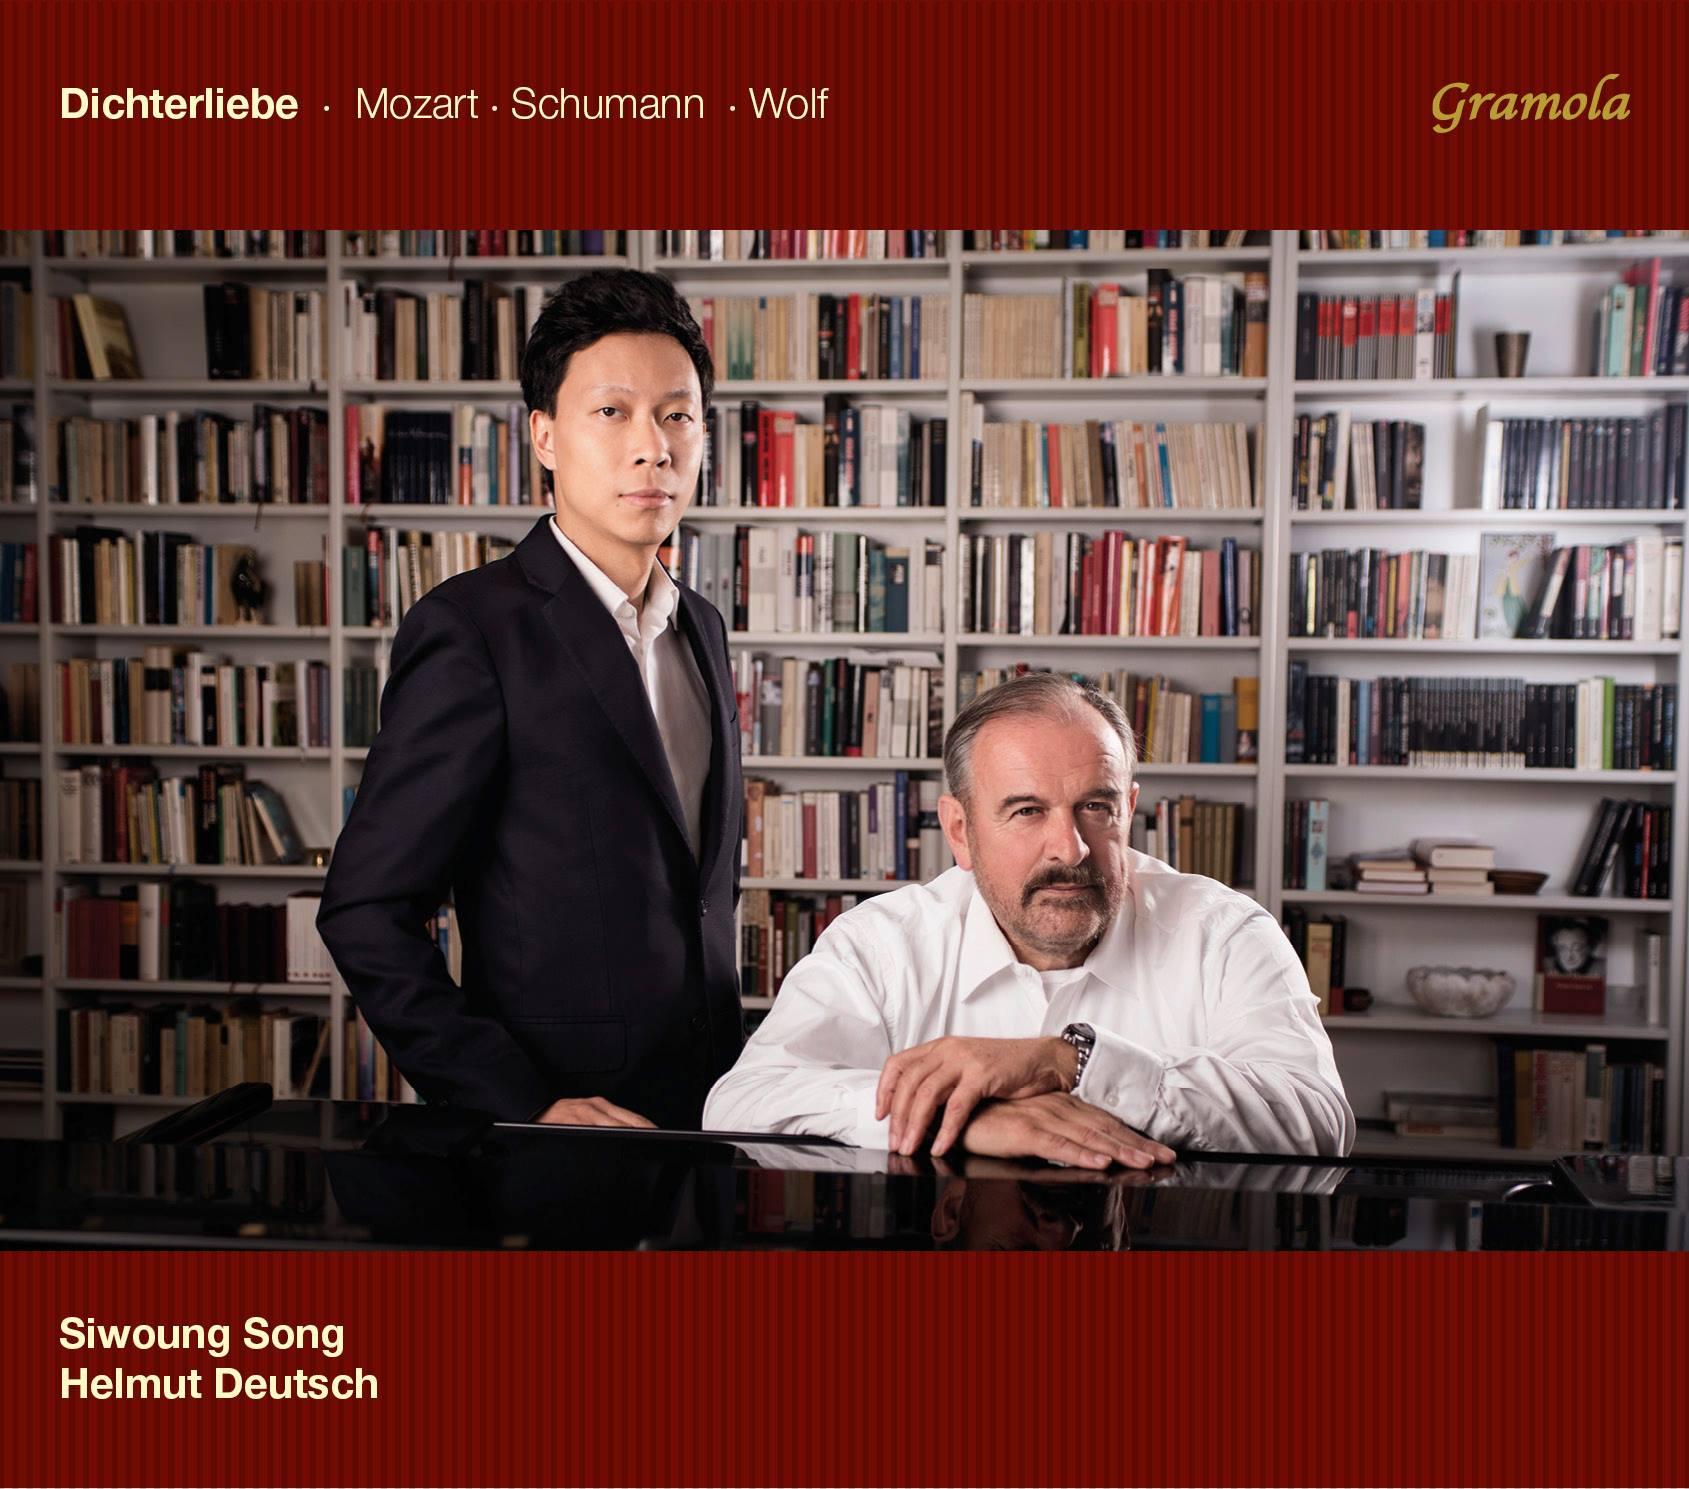 Dichterliebe - Bariton Siwoung Song and Pianist Helmut Deutsch